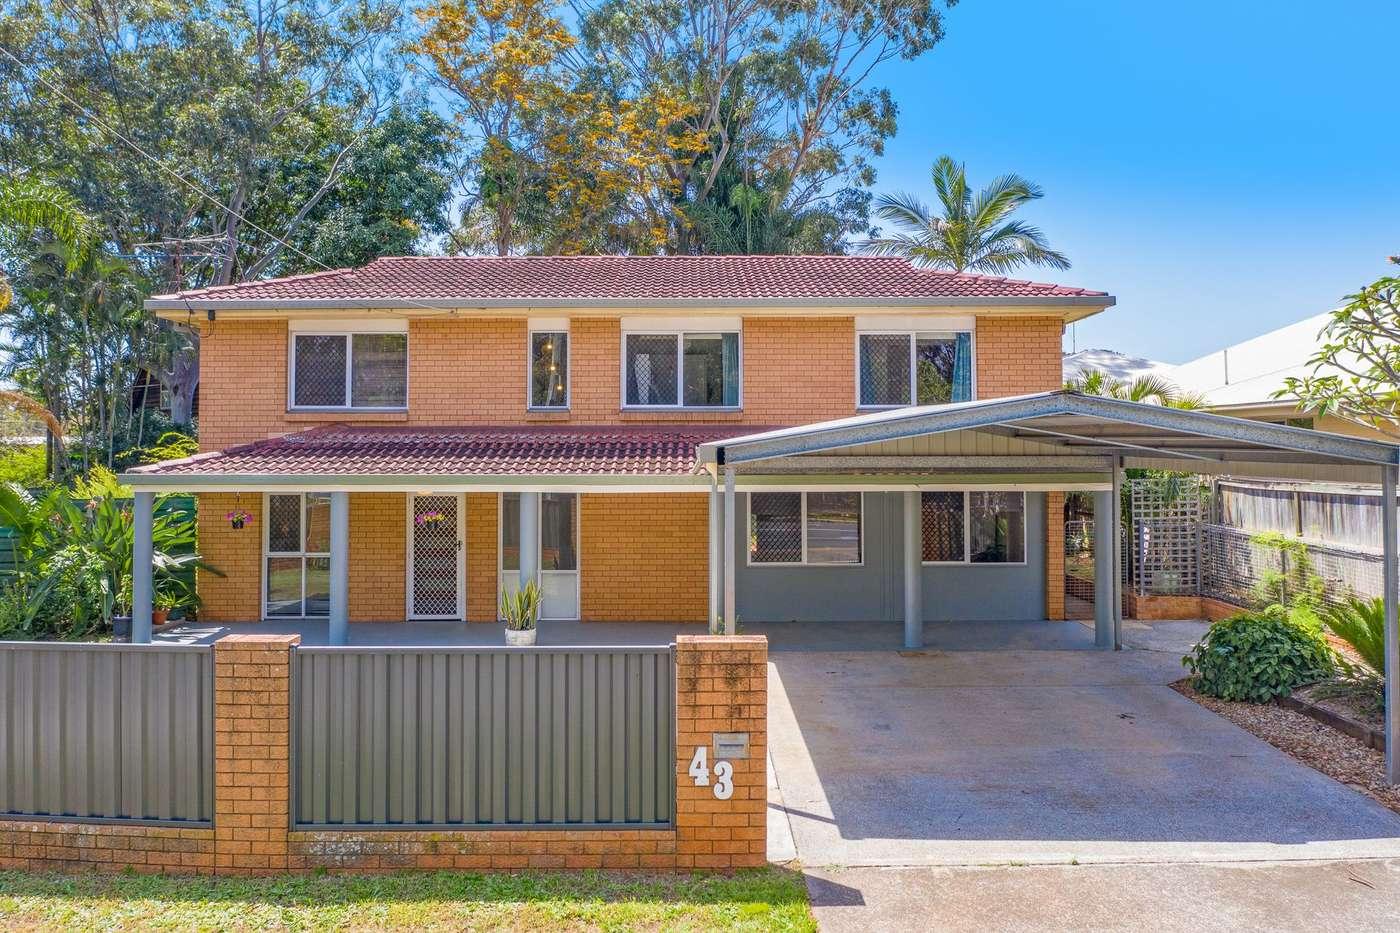 Main view of Homely house listing, 43 Bainbridge Street, Ormiston, QLD 4160